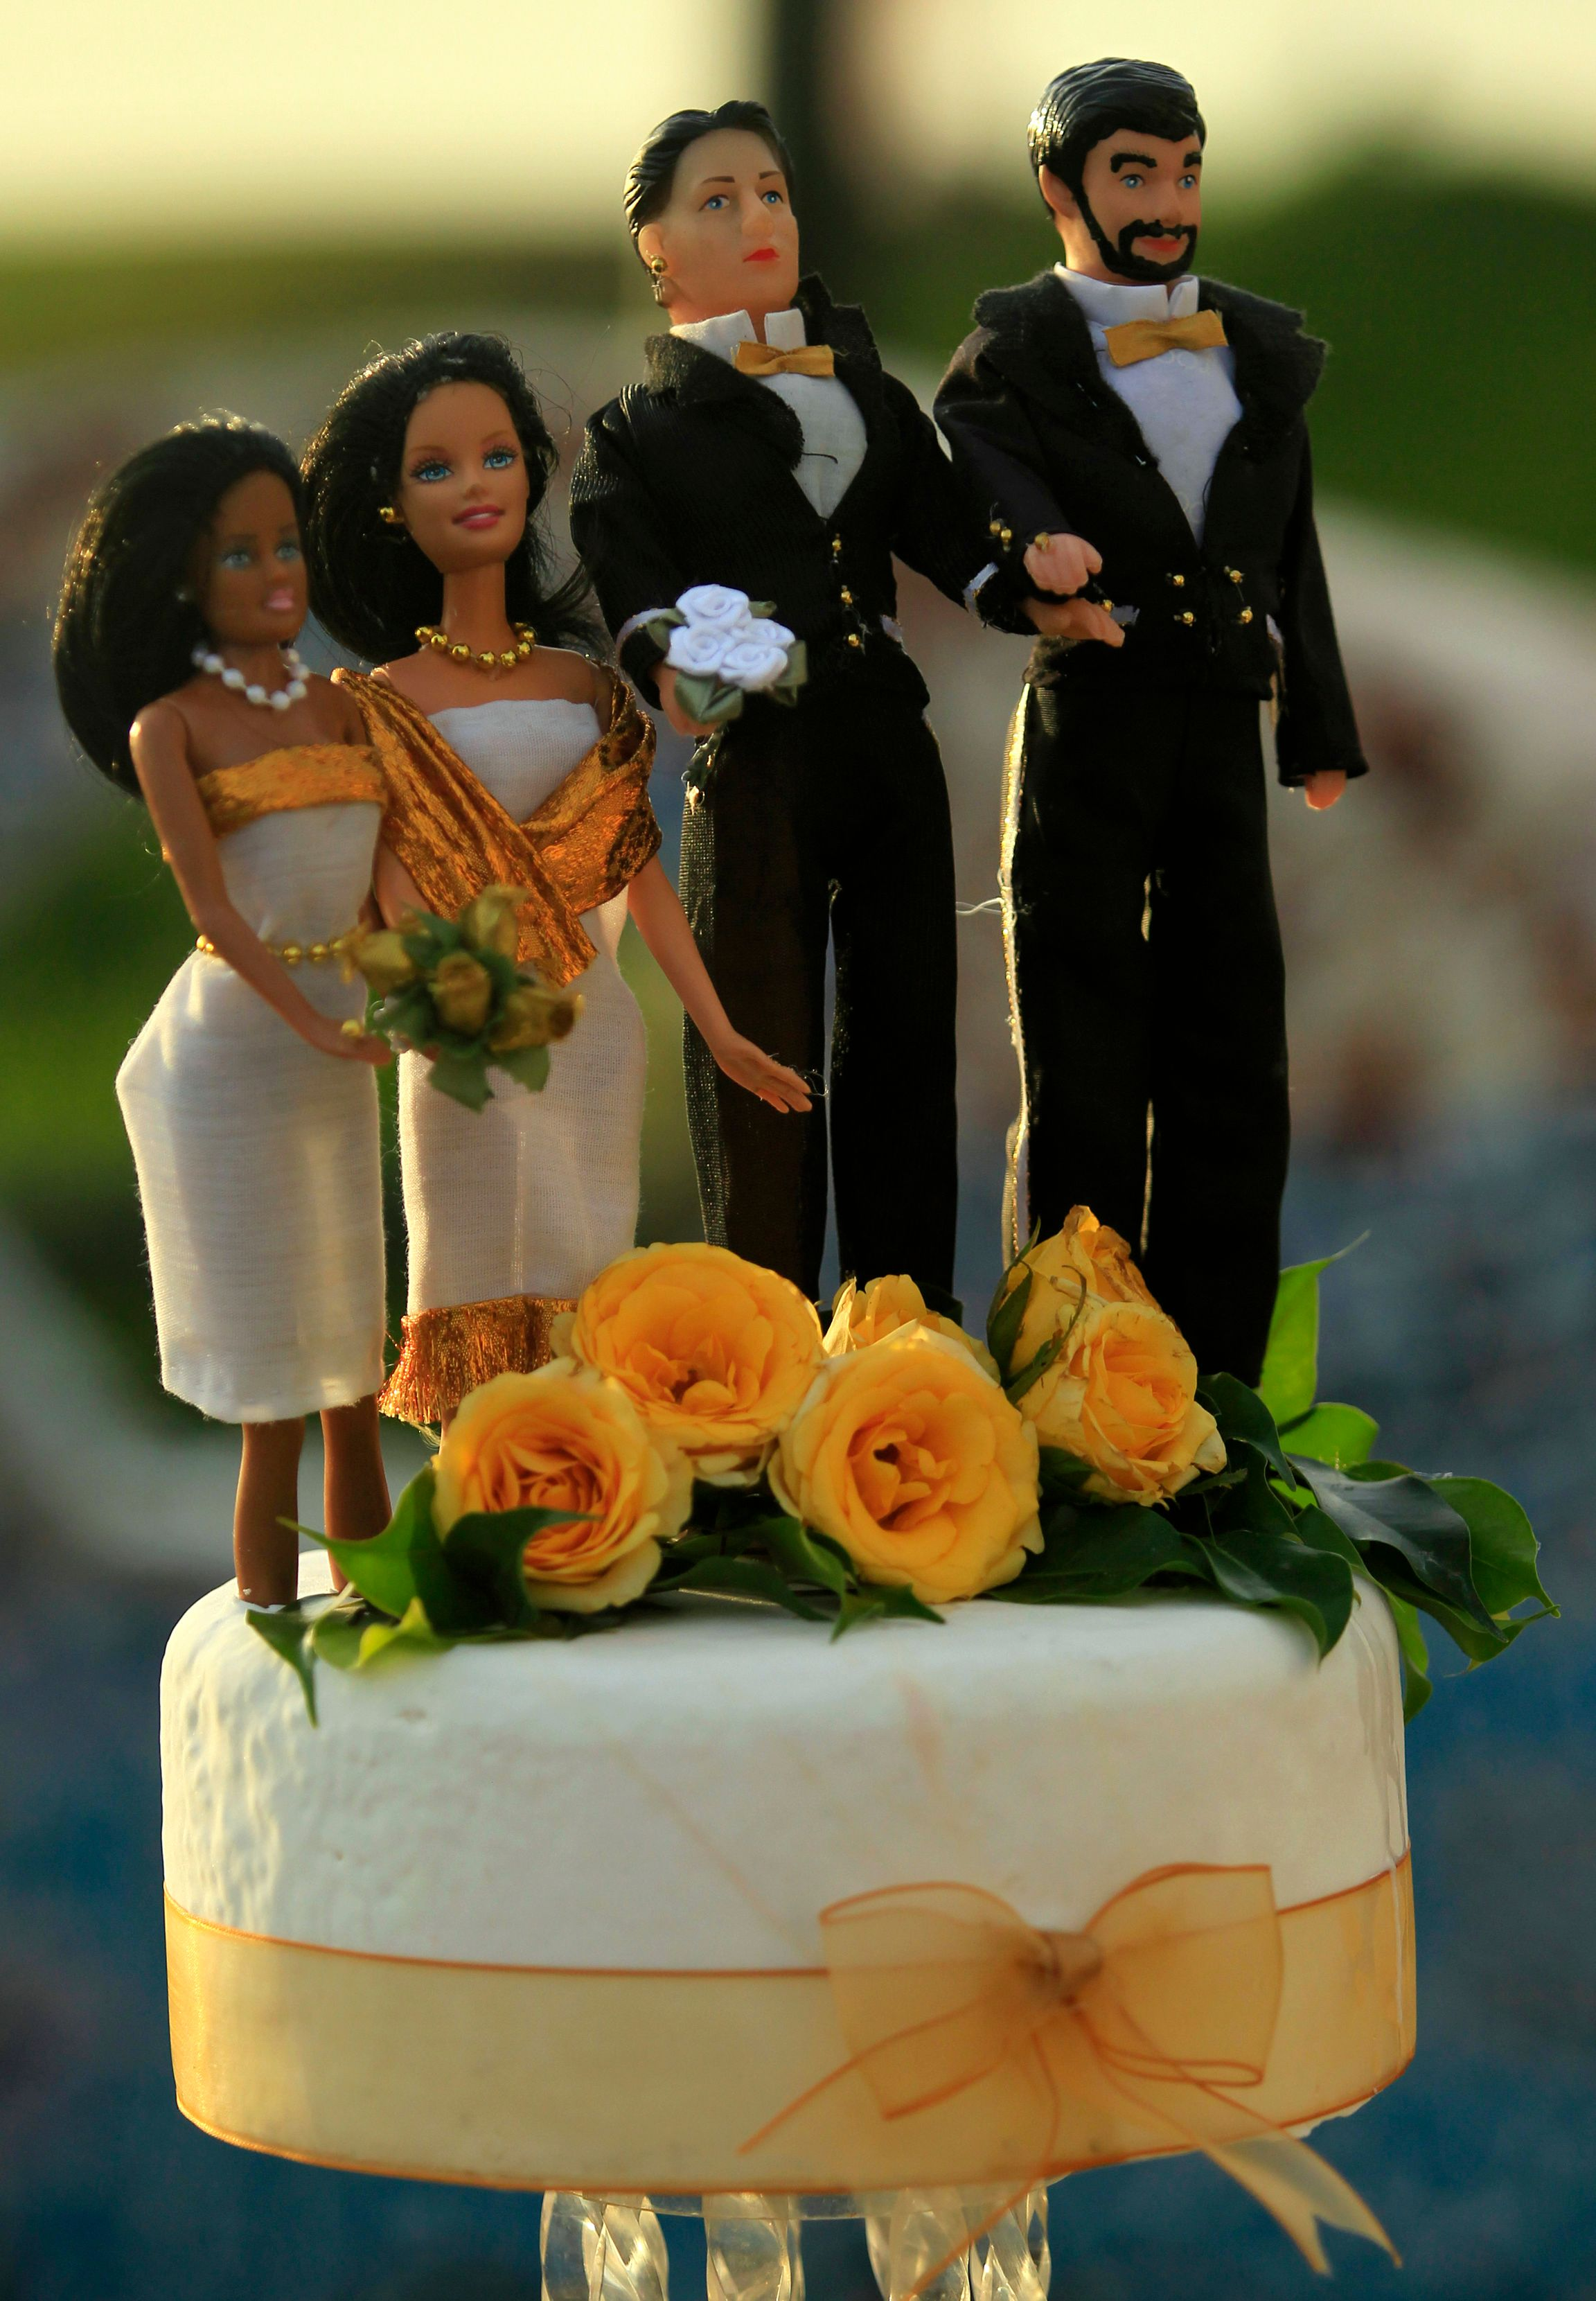 Mariage homosexuel : François Hollande reçoit Frigide Barjot et les opposants au projet